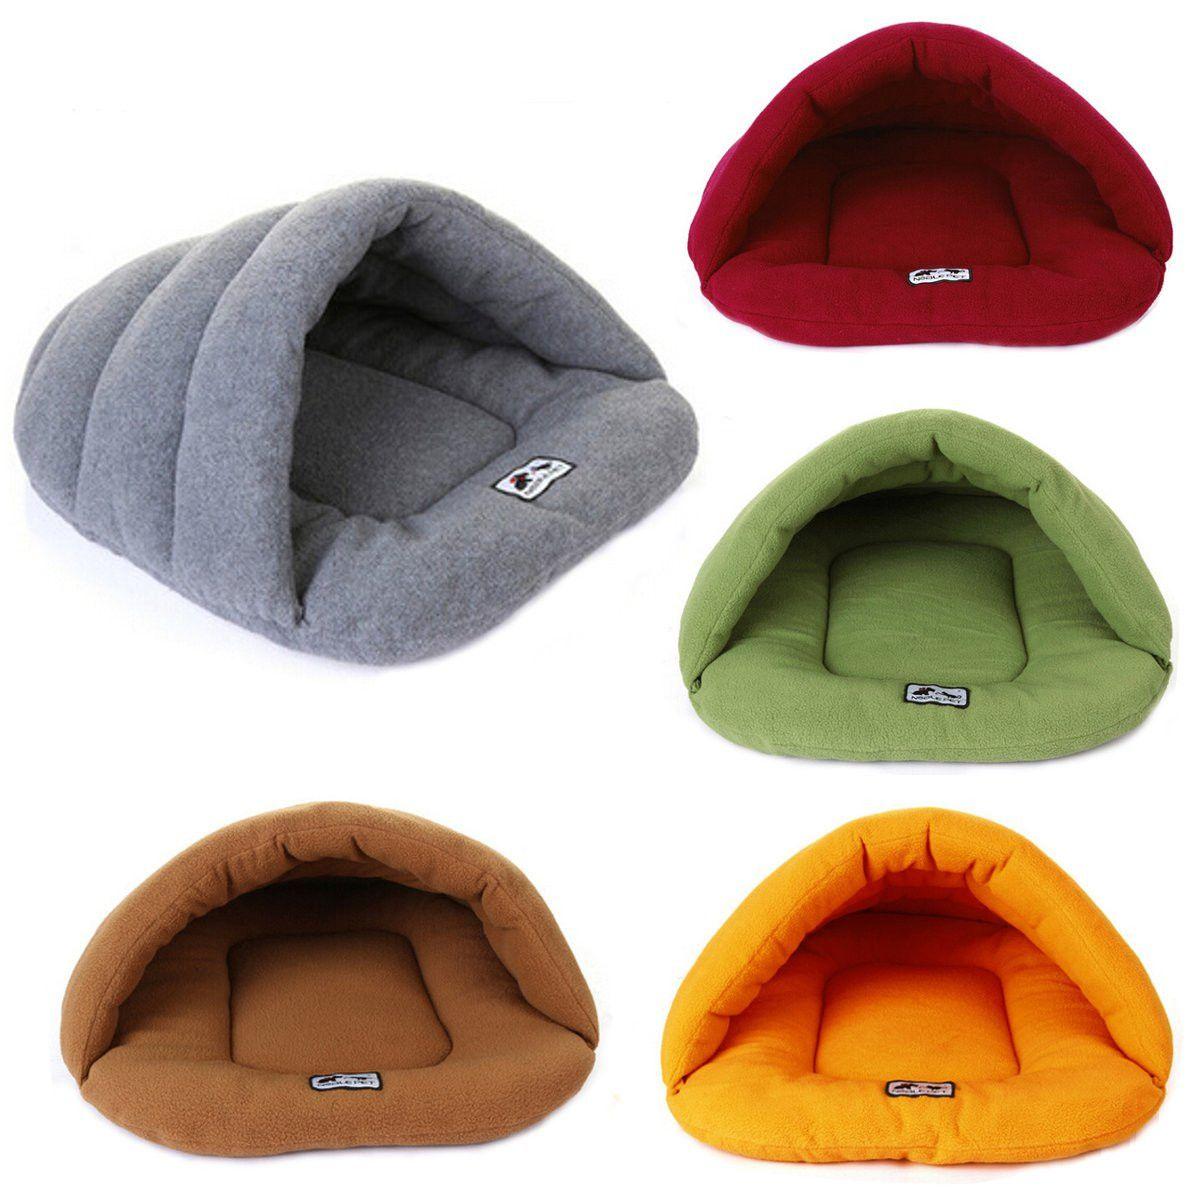 Pet Cat Dog Sleeping Bag Cushion Warm Comfortable House